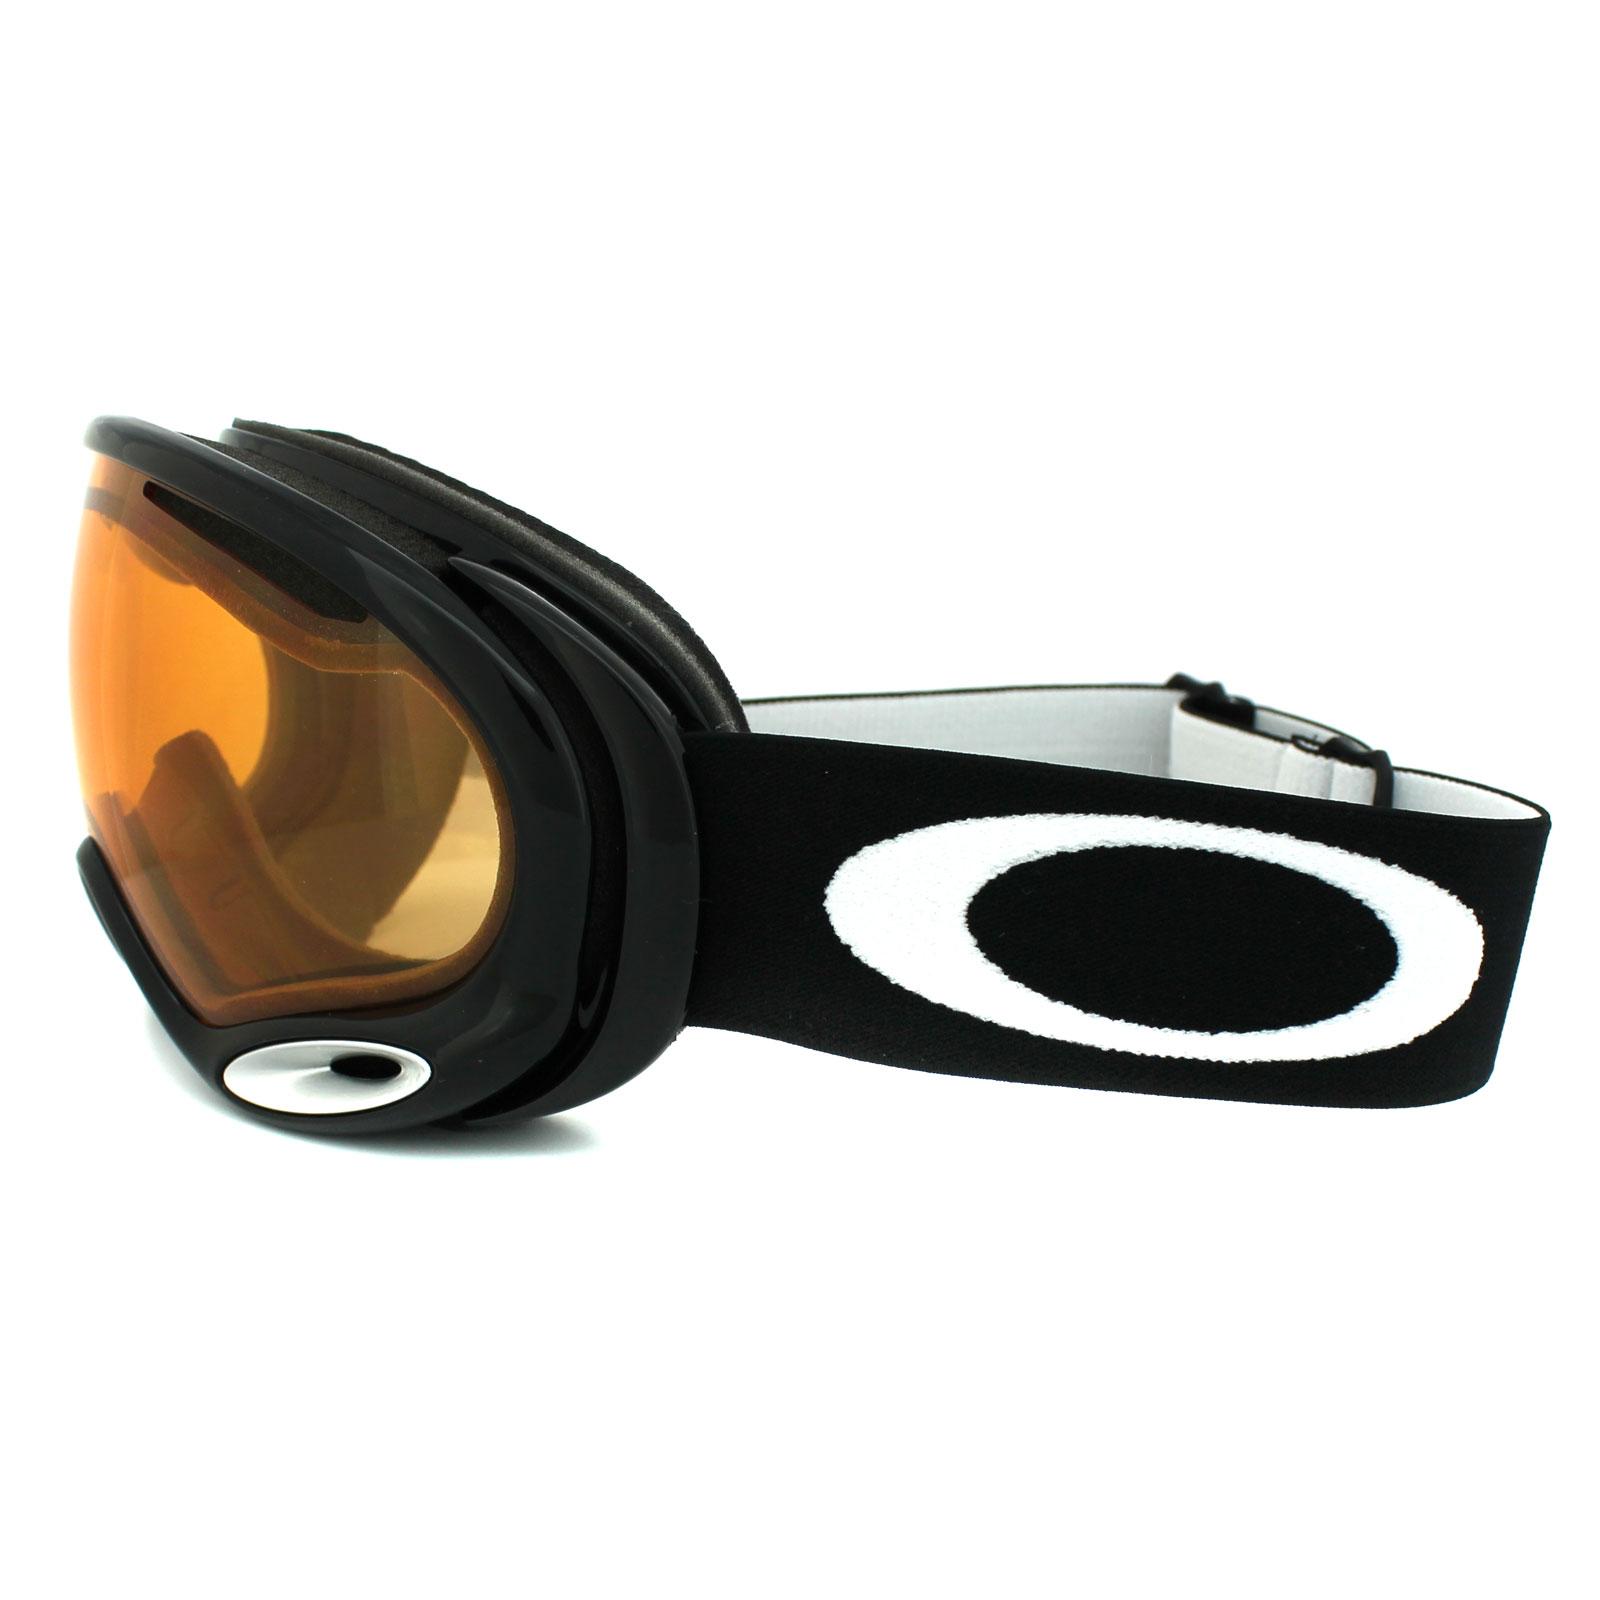 Oakley Ski Goggles A Frame 2.0 59-633 Jet Black Persimmon ...